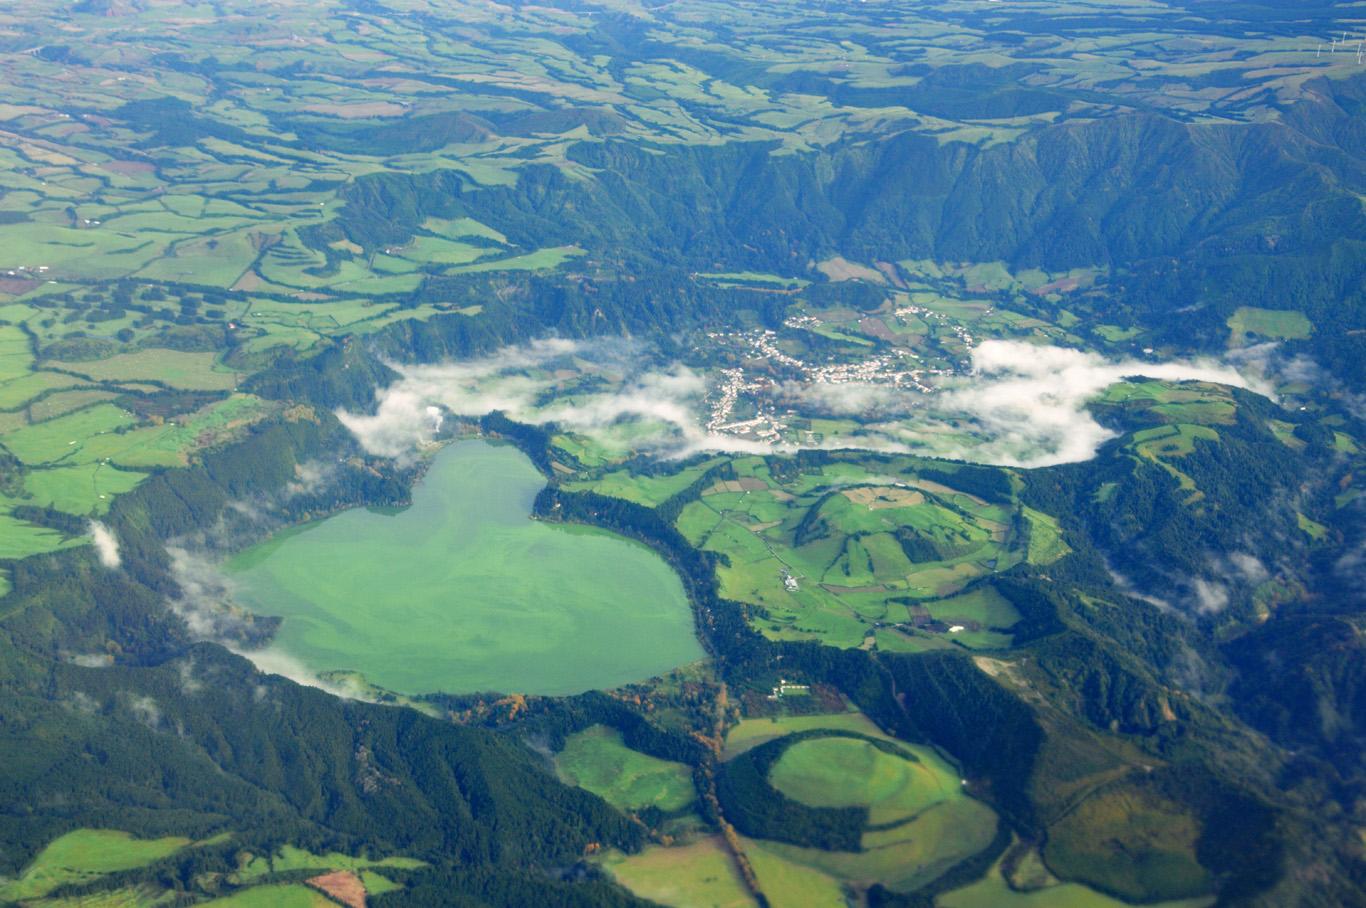 Furnas caldera - aerial view